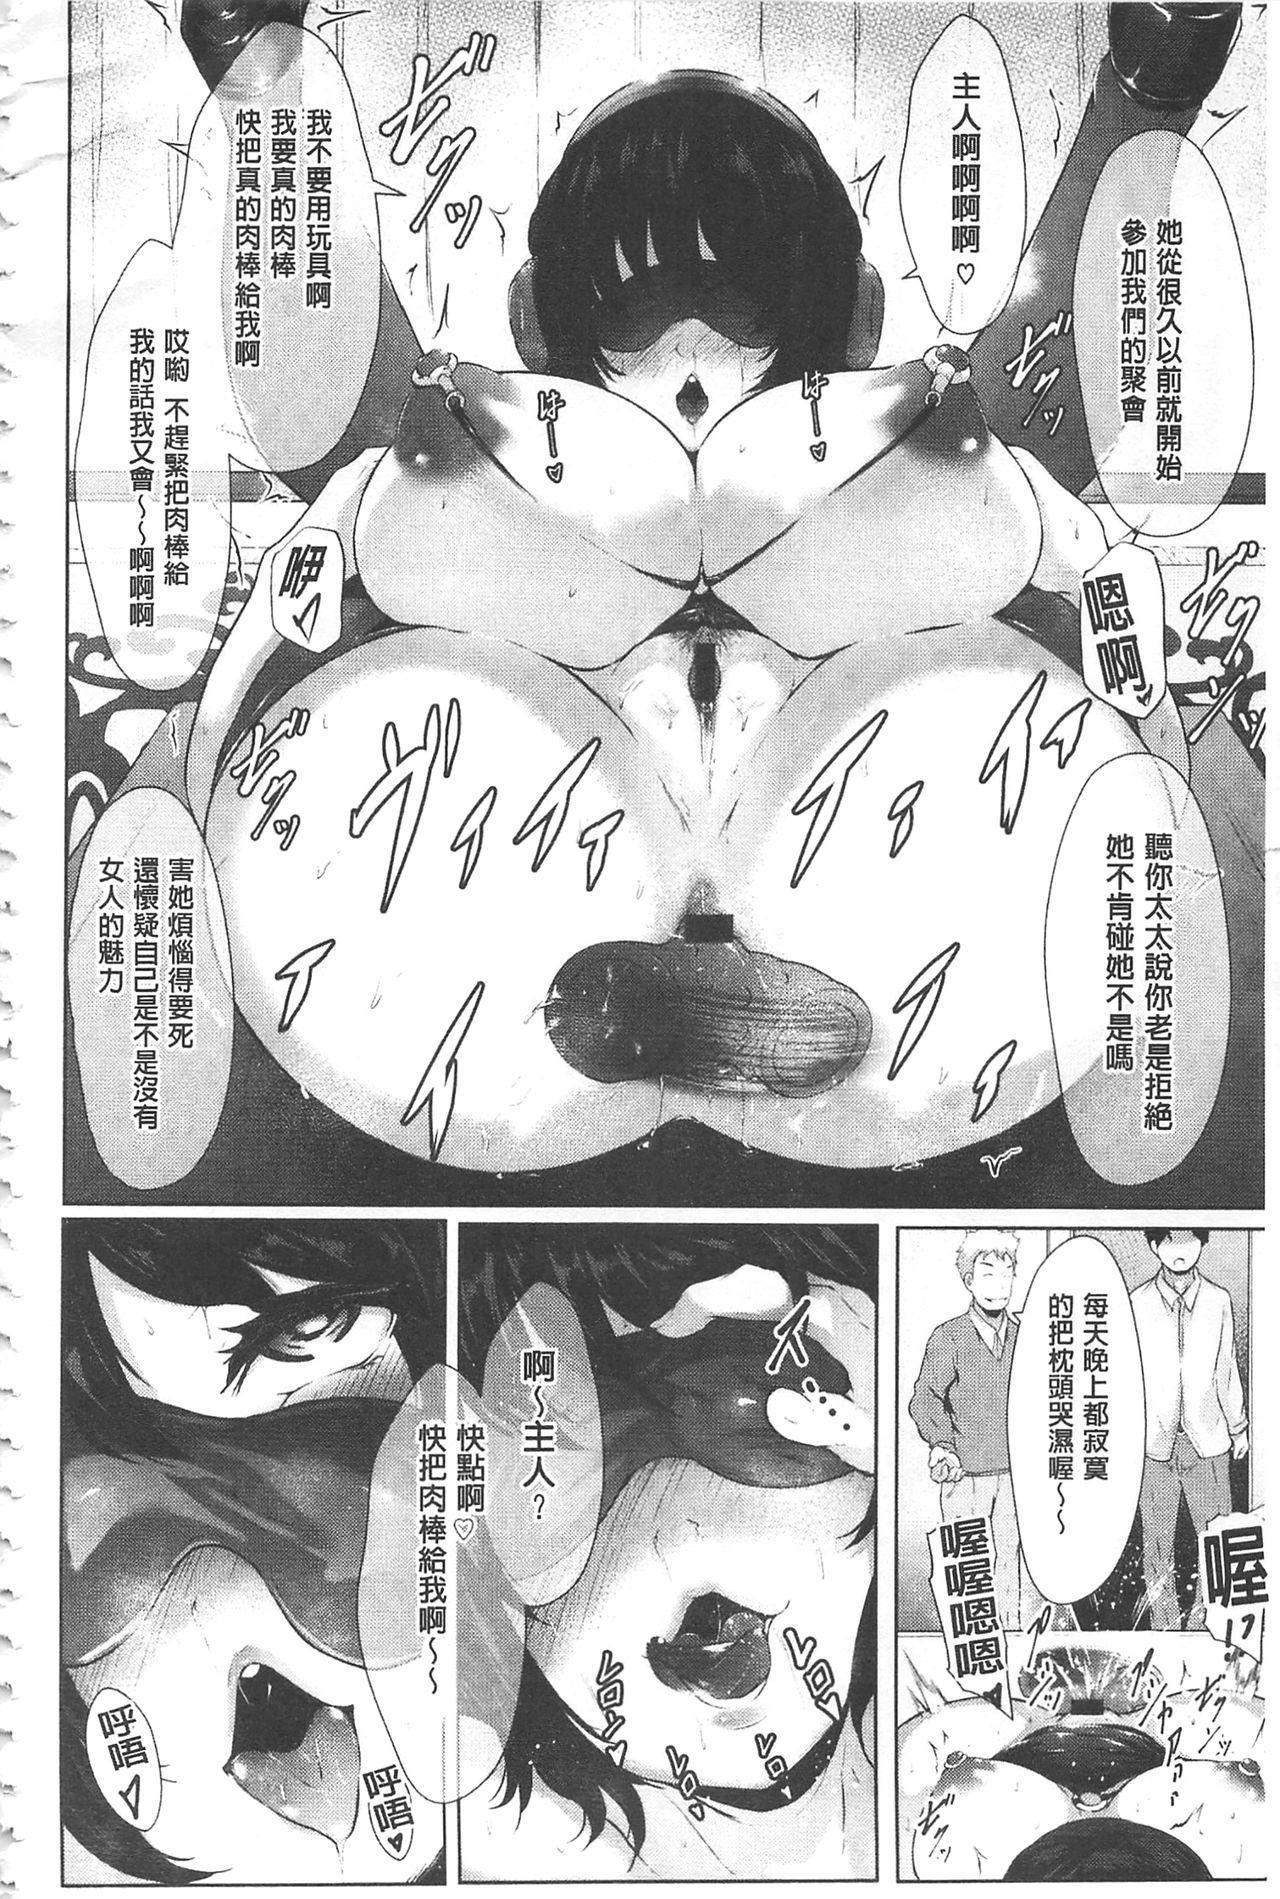 [Lorica] Biinkan Anal ~Kakusei Nejikomi Ana~ | 美淫感猥菊花 塞入擴張覺醒穴 [Chinese] 164